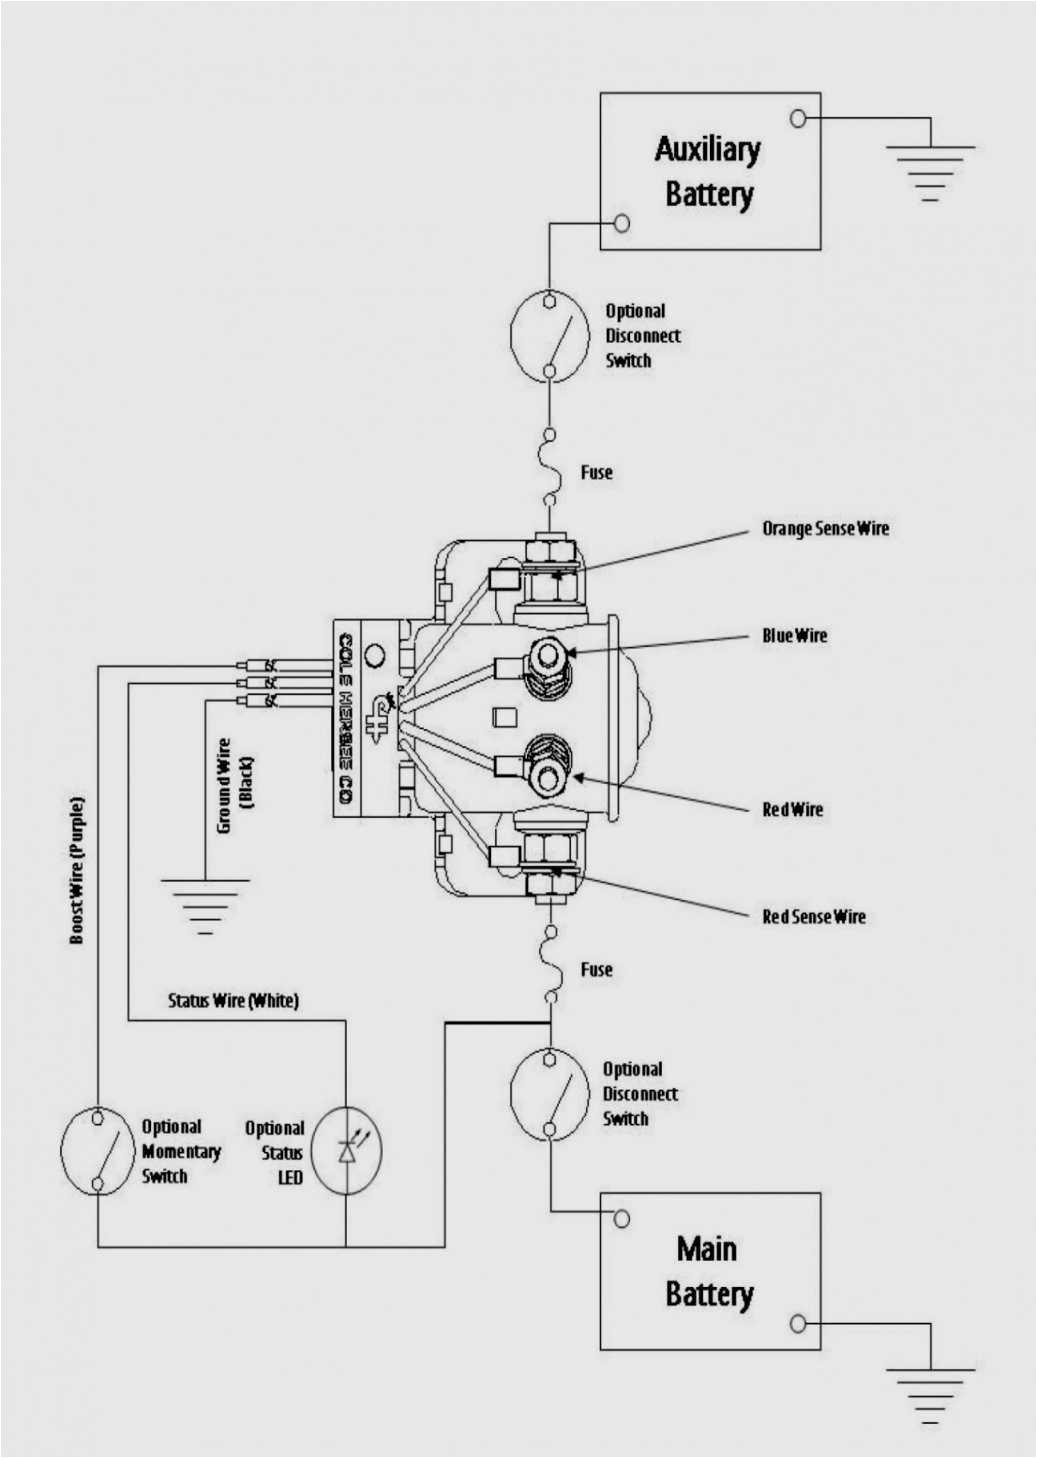 diagram winch wiring xp9 5warn wiring diagram datasourcepower winch wiring diagram diagram data schema diagram winch